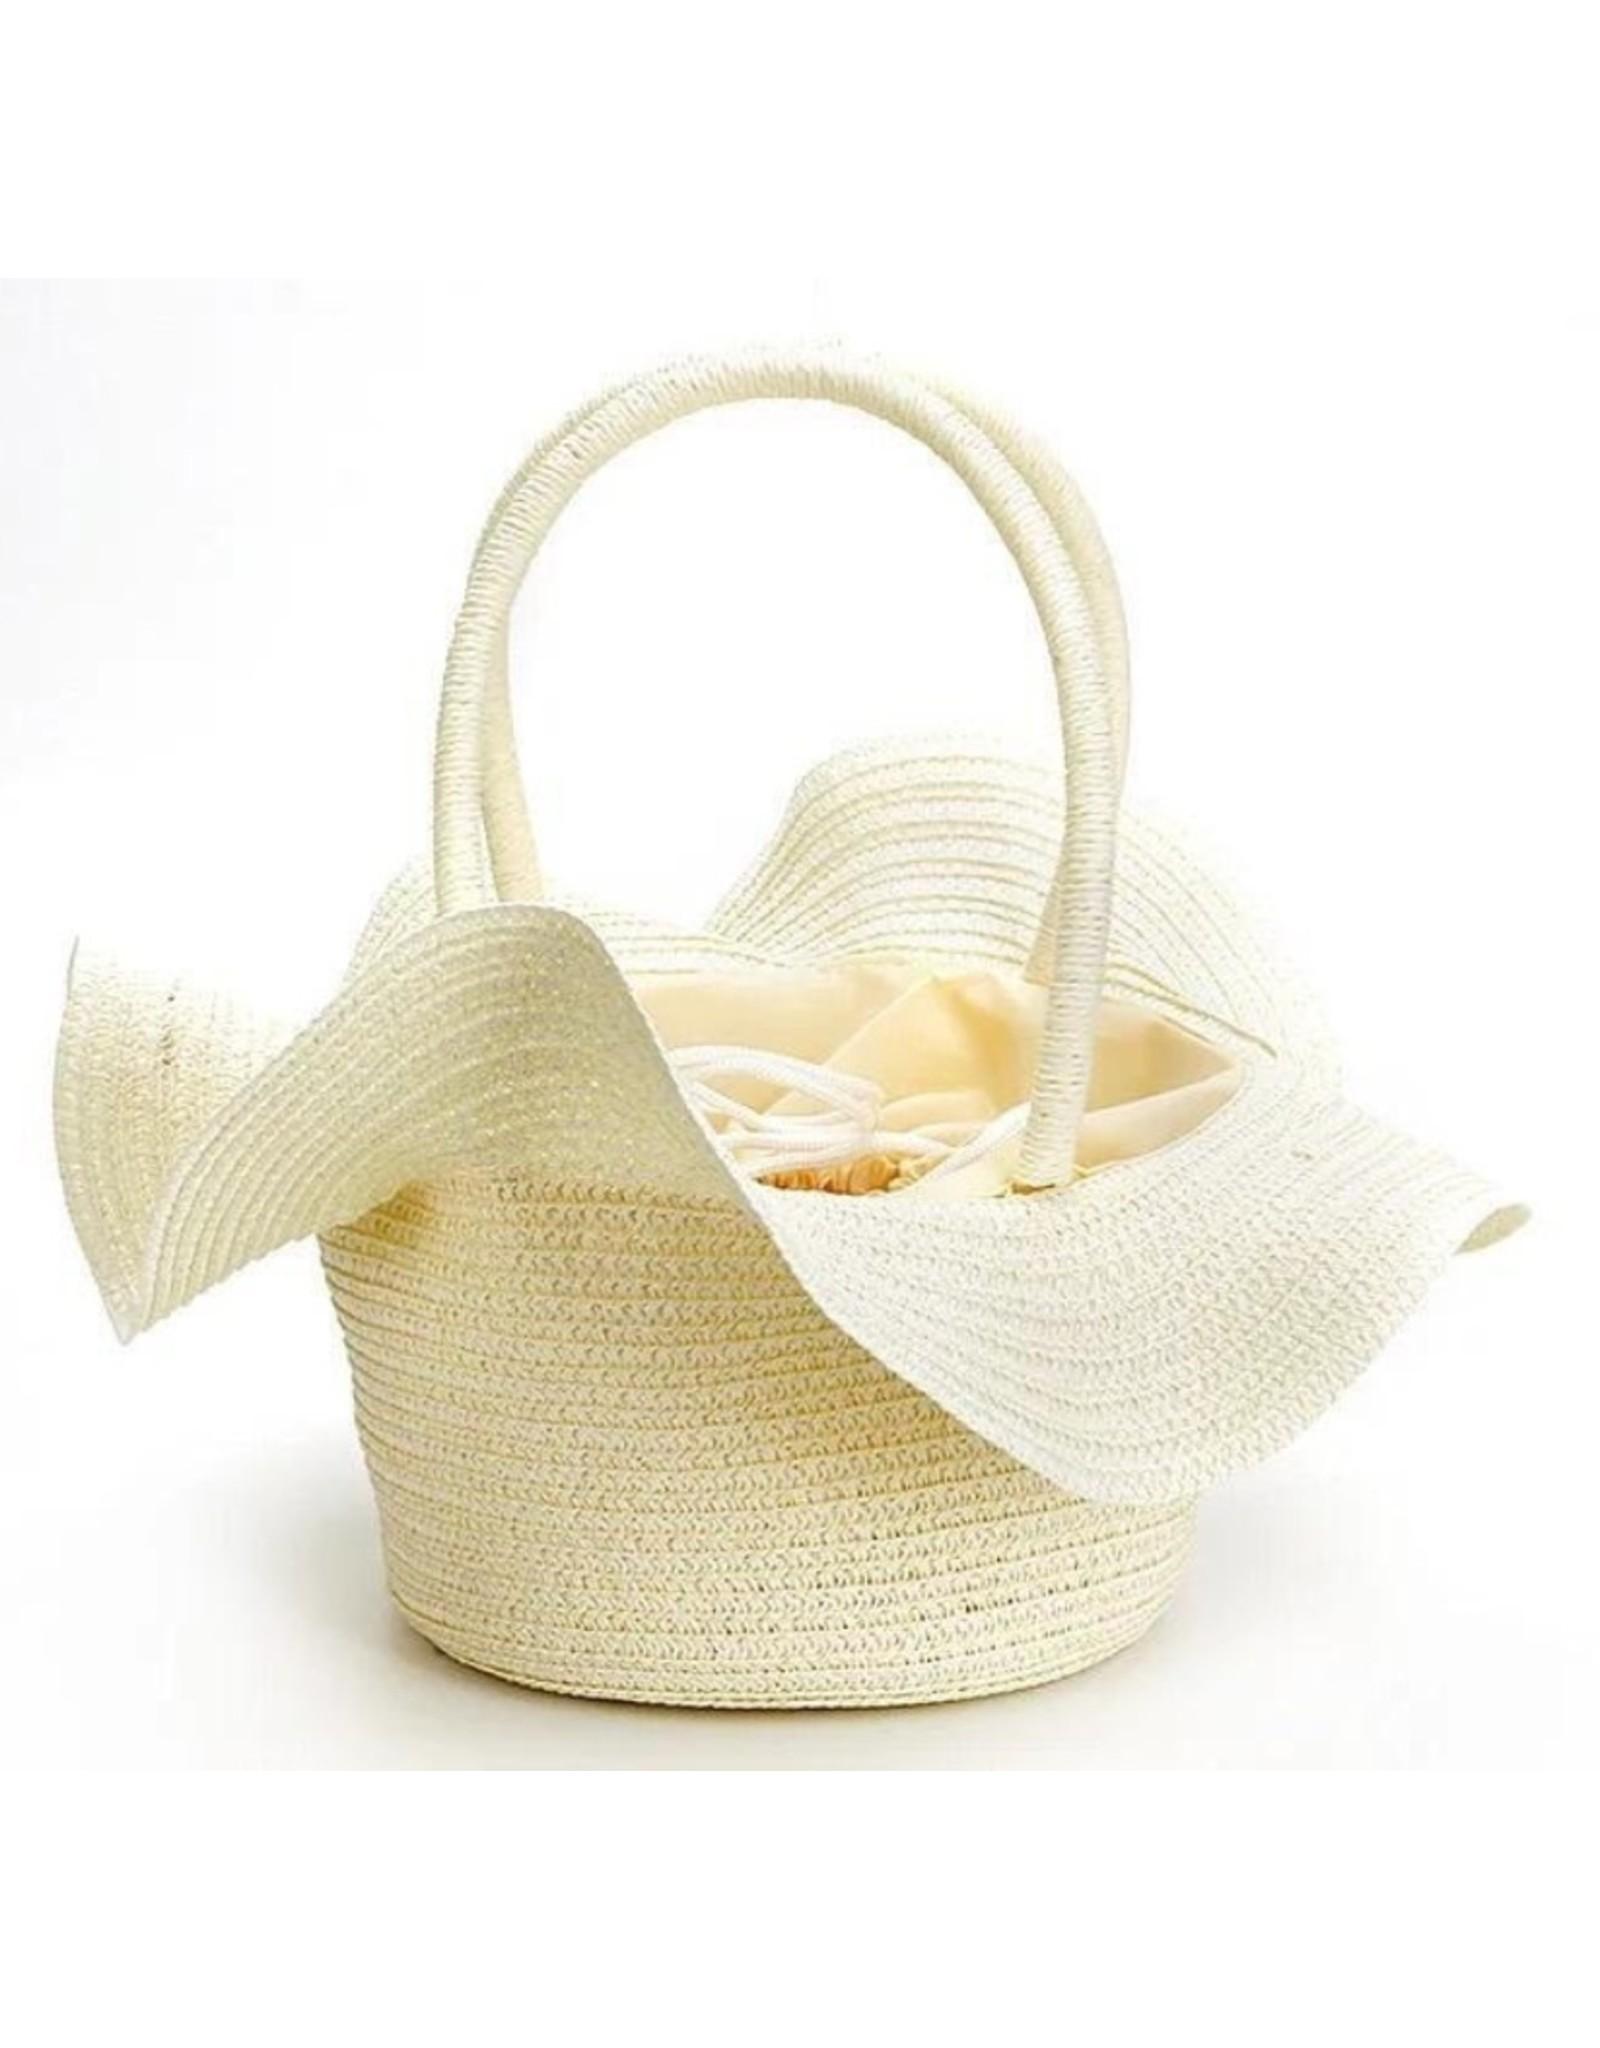 Trukado Fantasy bags and wallets - Fantasy handbag Hat